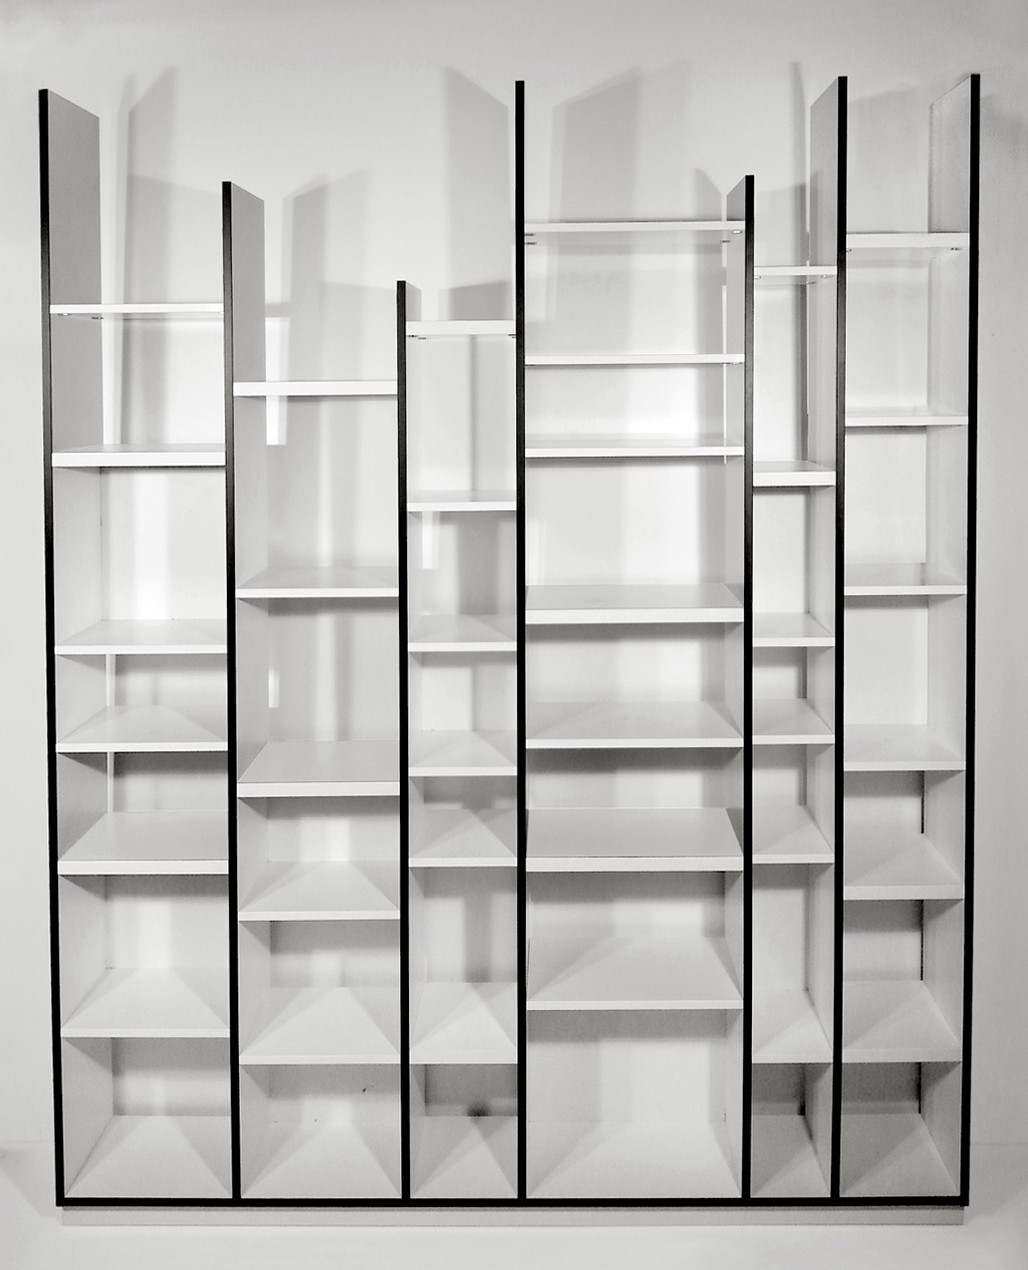 Boekenkast modern design het beste van huis ontwerp inspiratie - Moderne boekenkast ...